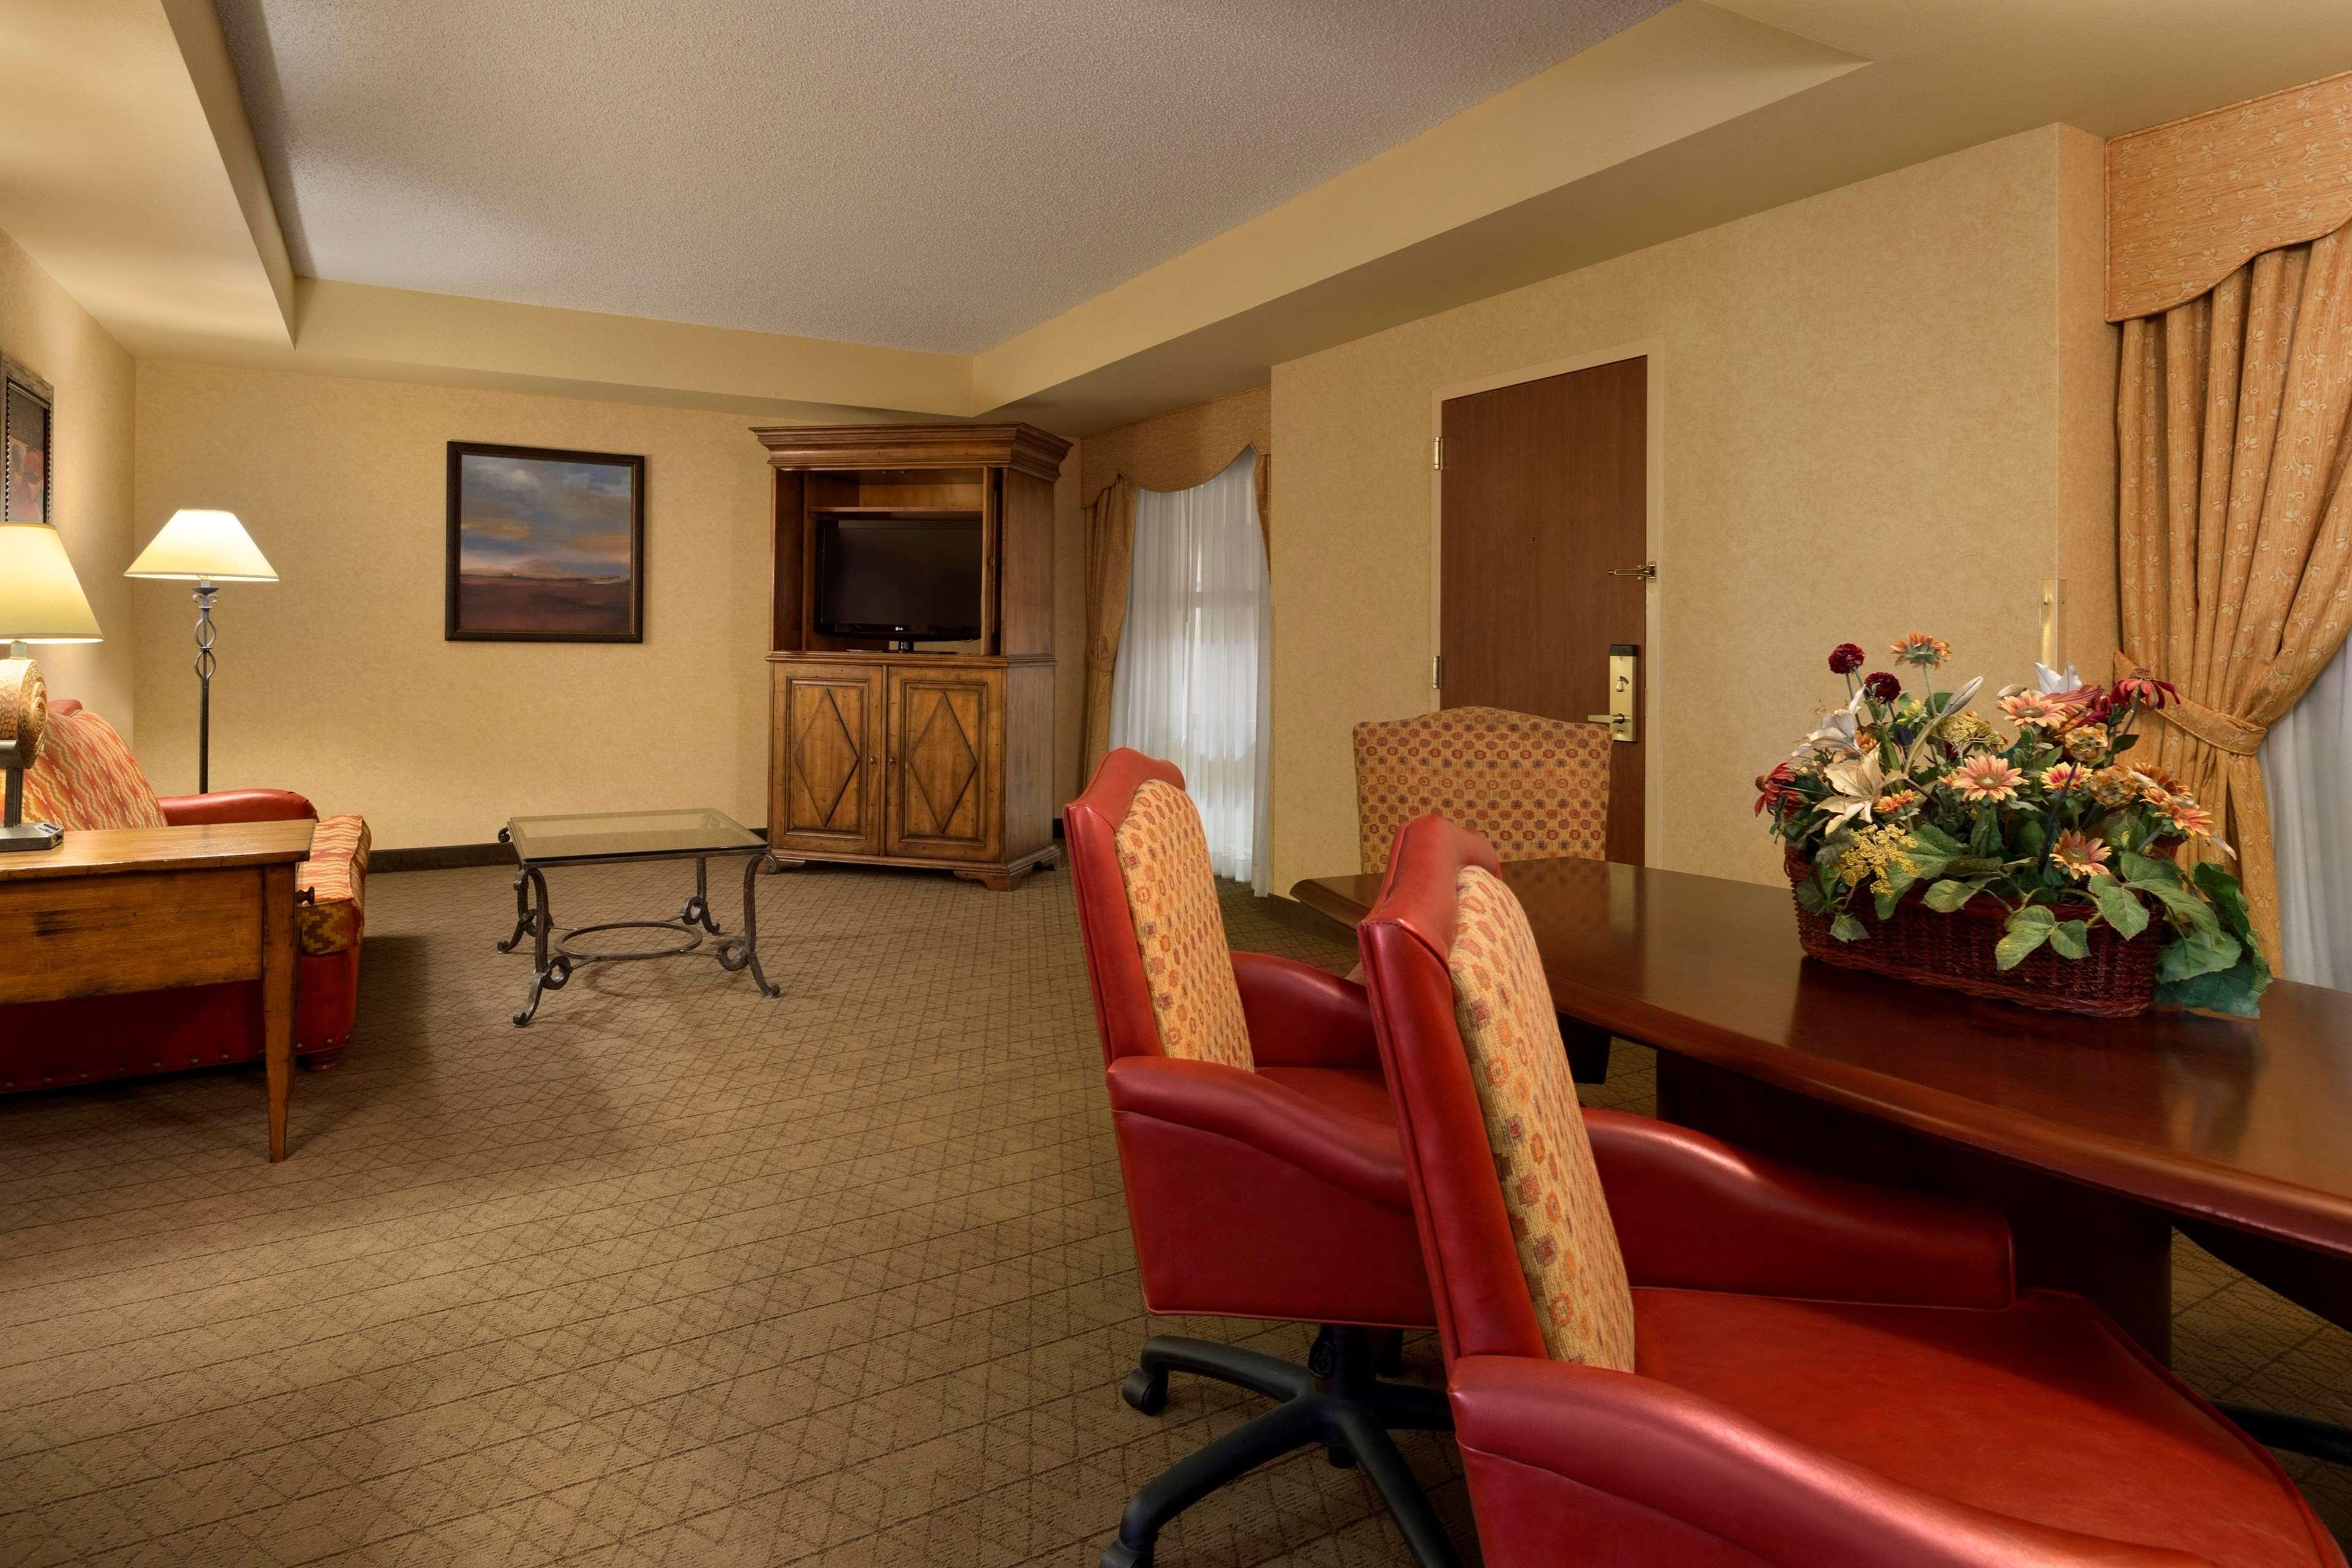 Embassy Suites by Hilton Albuquerque Hotel & Spa image 11